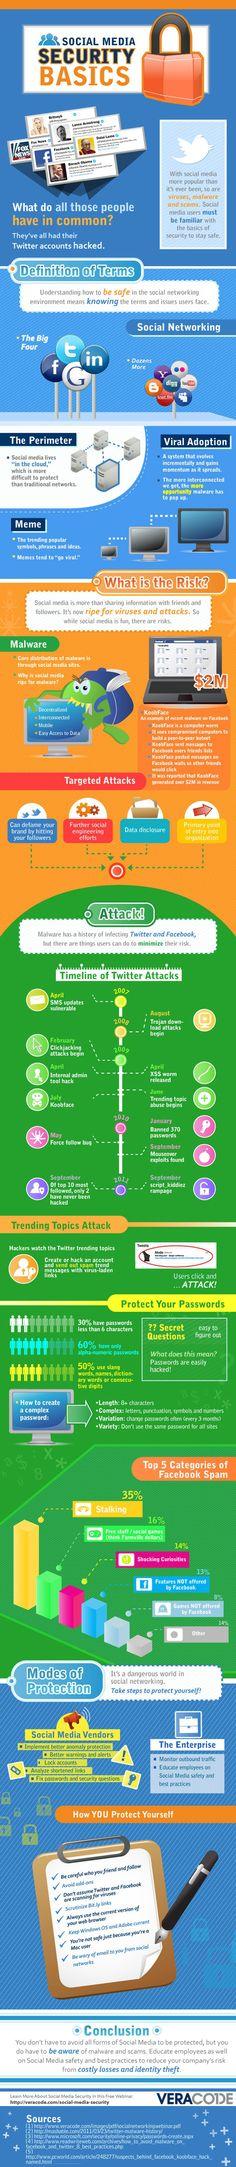 Social Media Security Basics